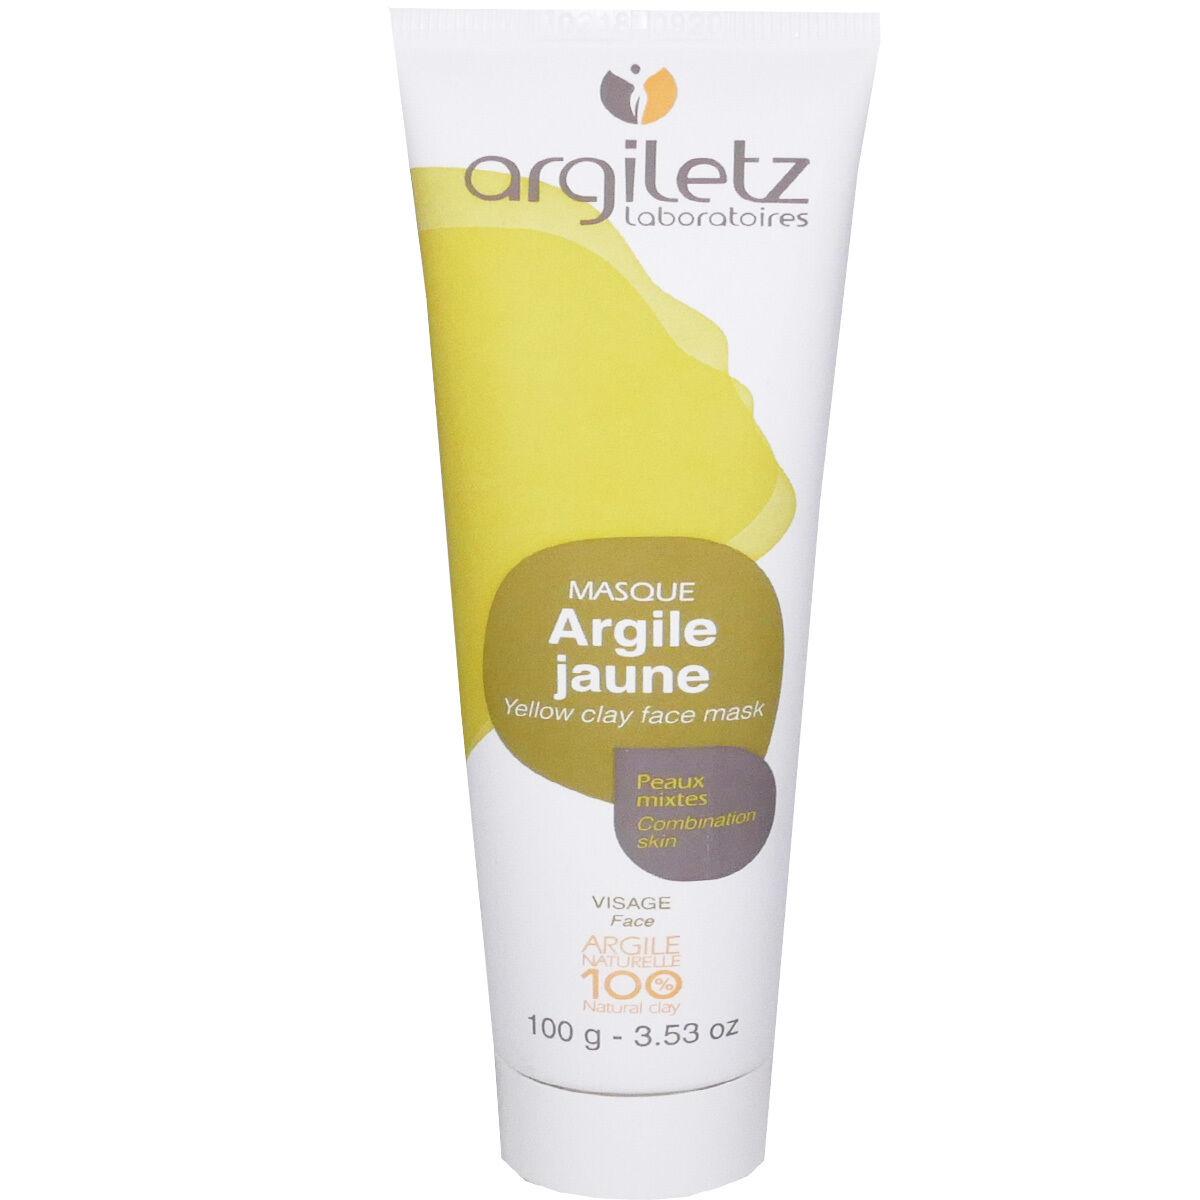 Argiletz argile jaune peaux mixtes 100 g